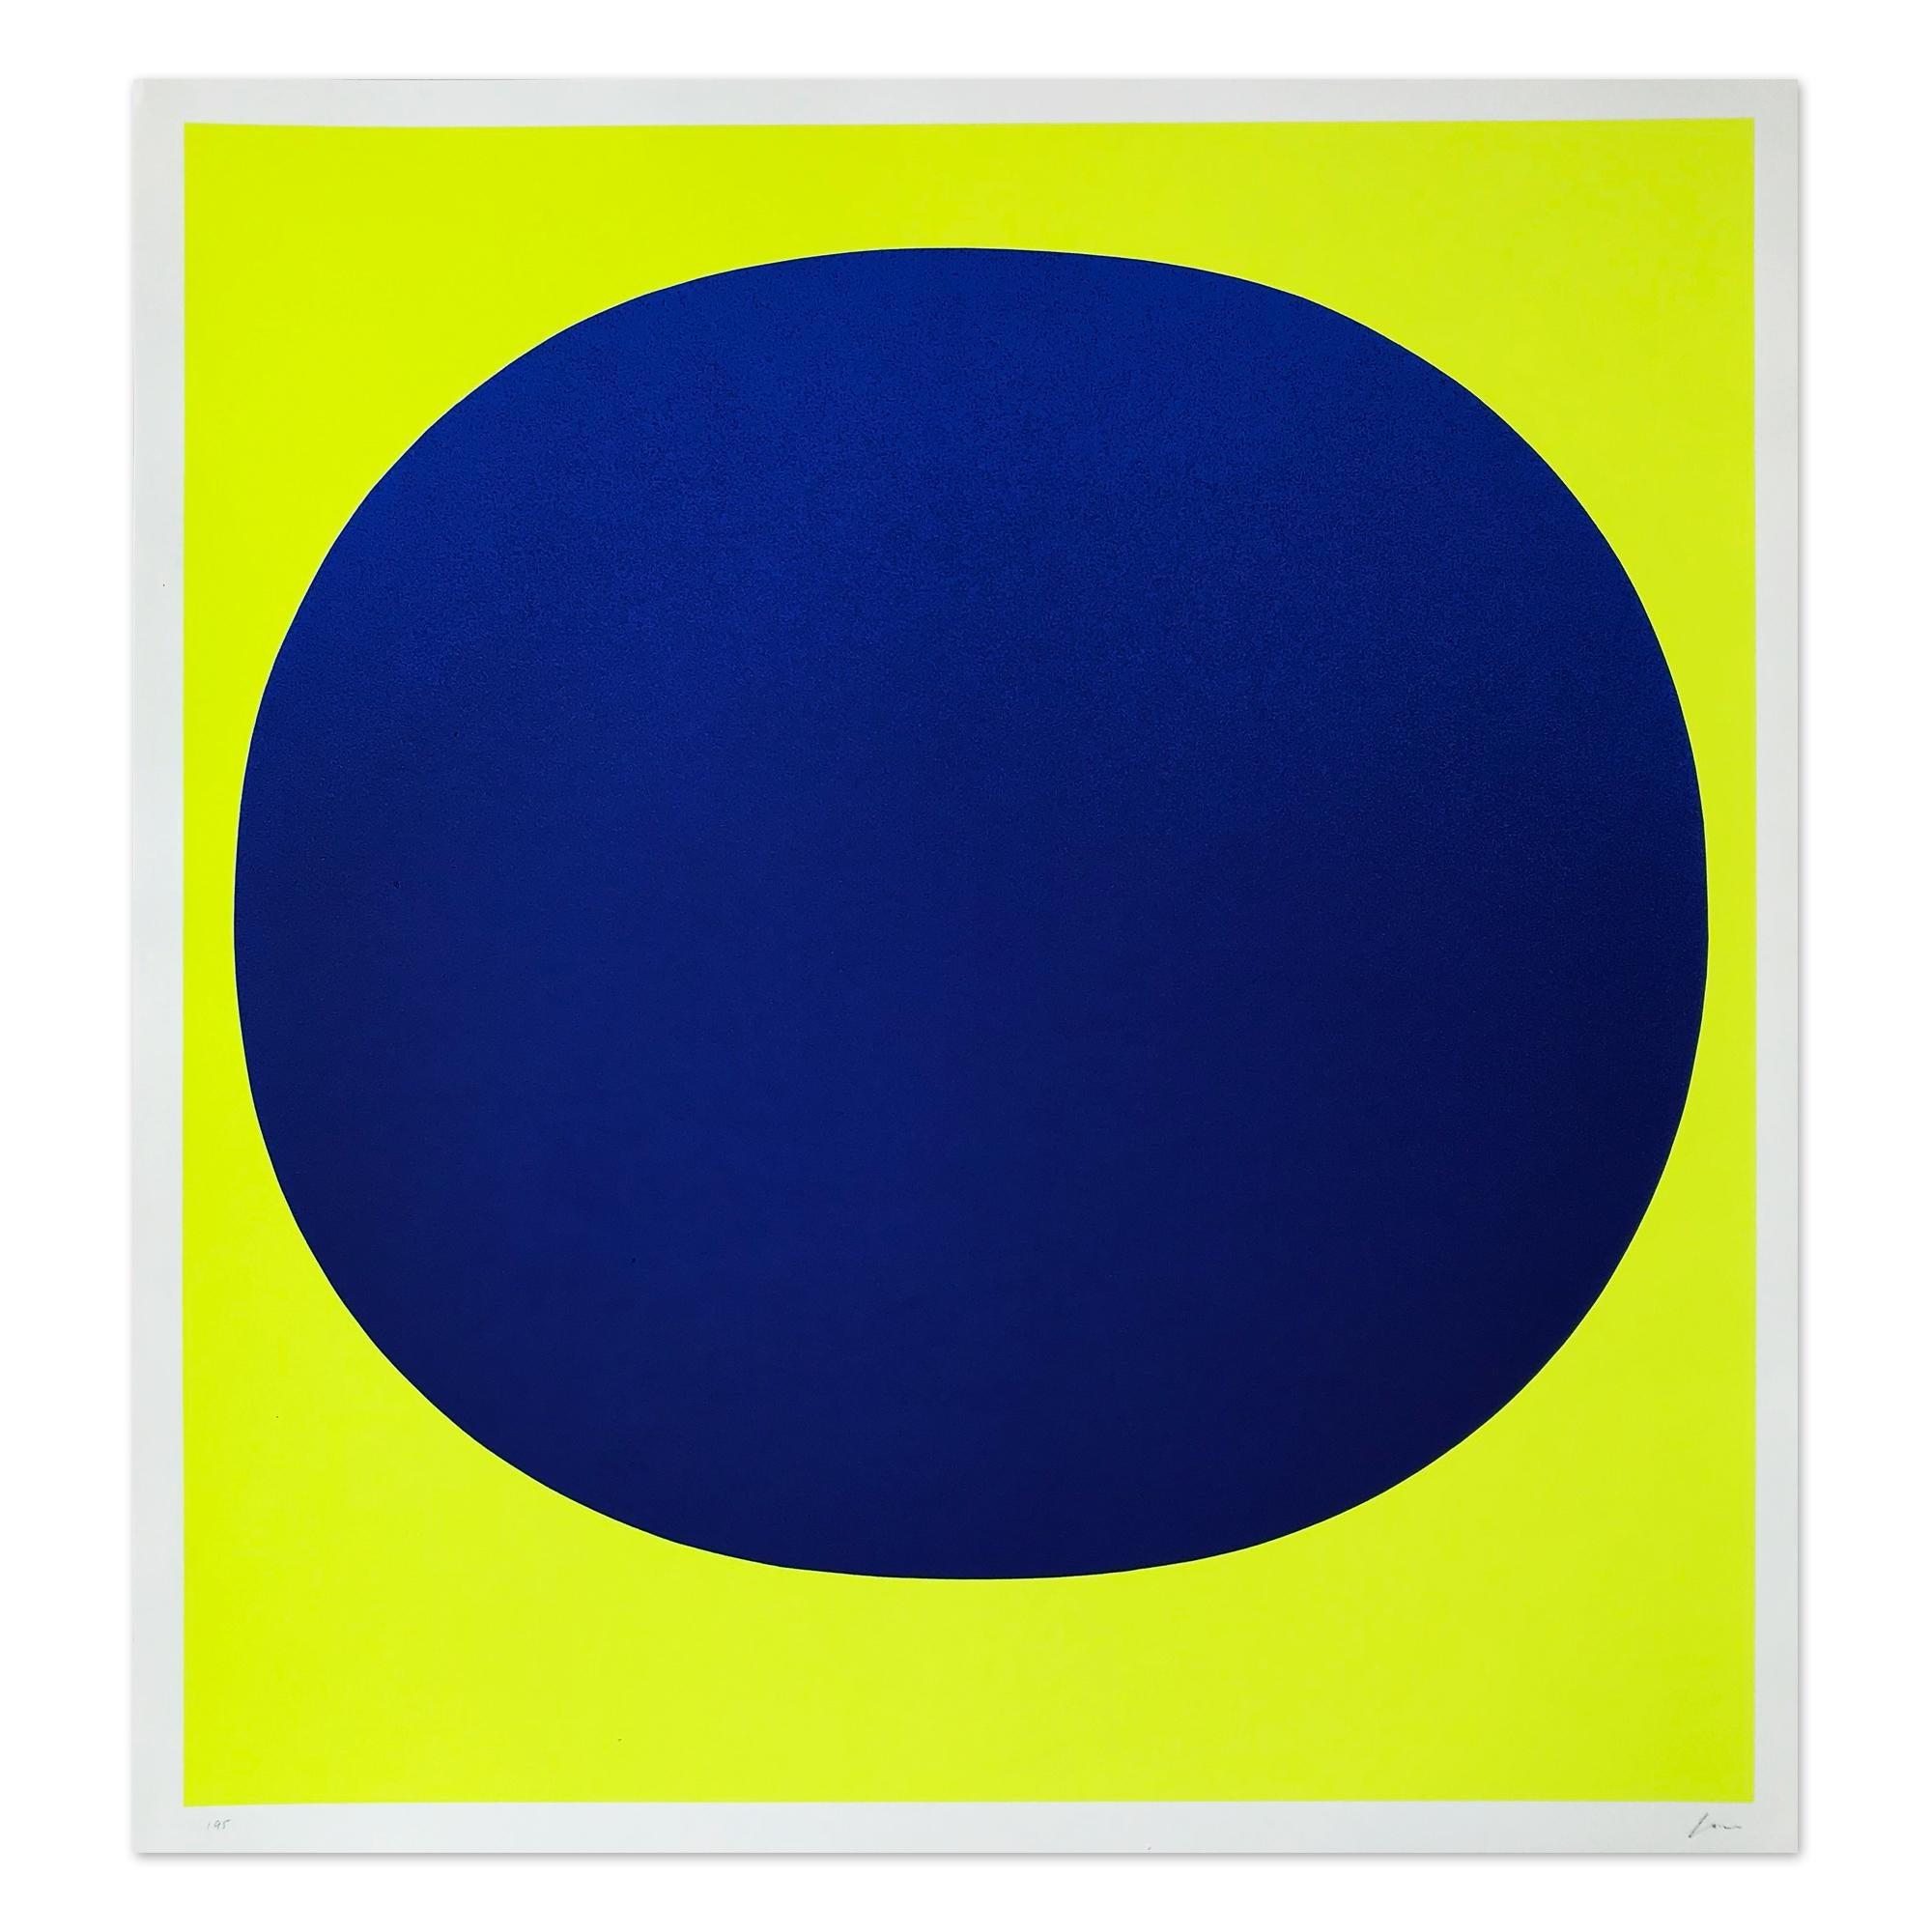 Blue on Yellow, Silkscreen, Abstract Art, Minimalism, 20th Century